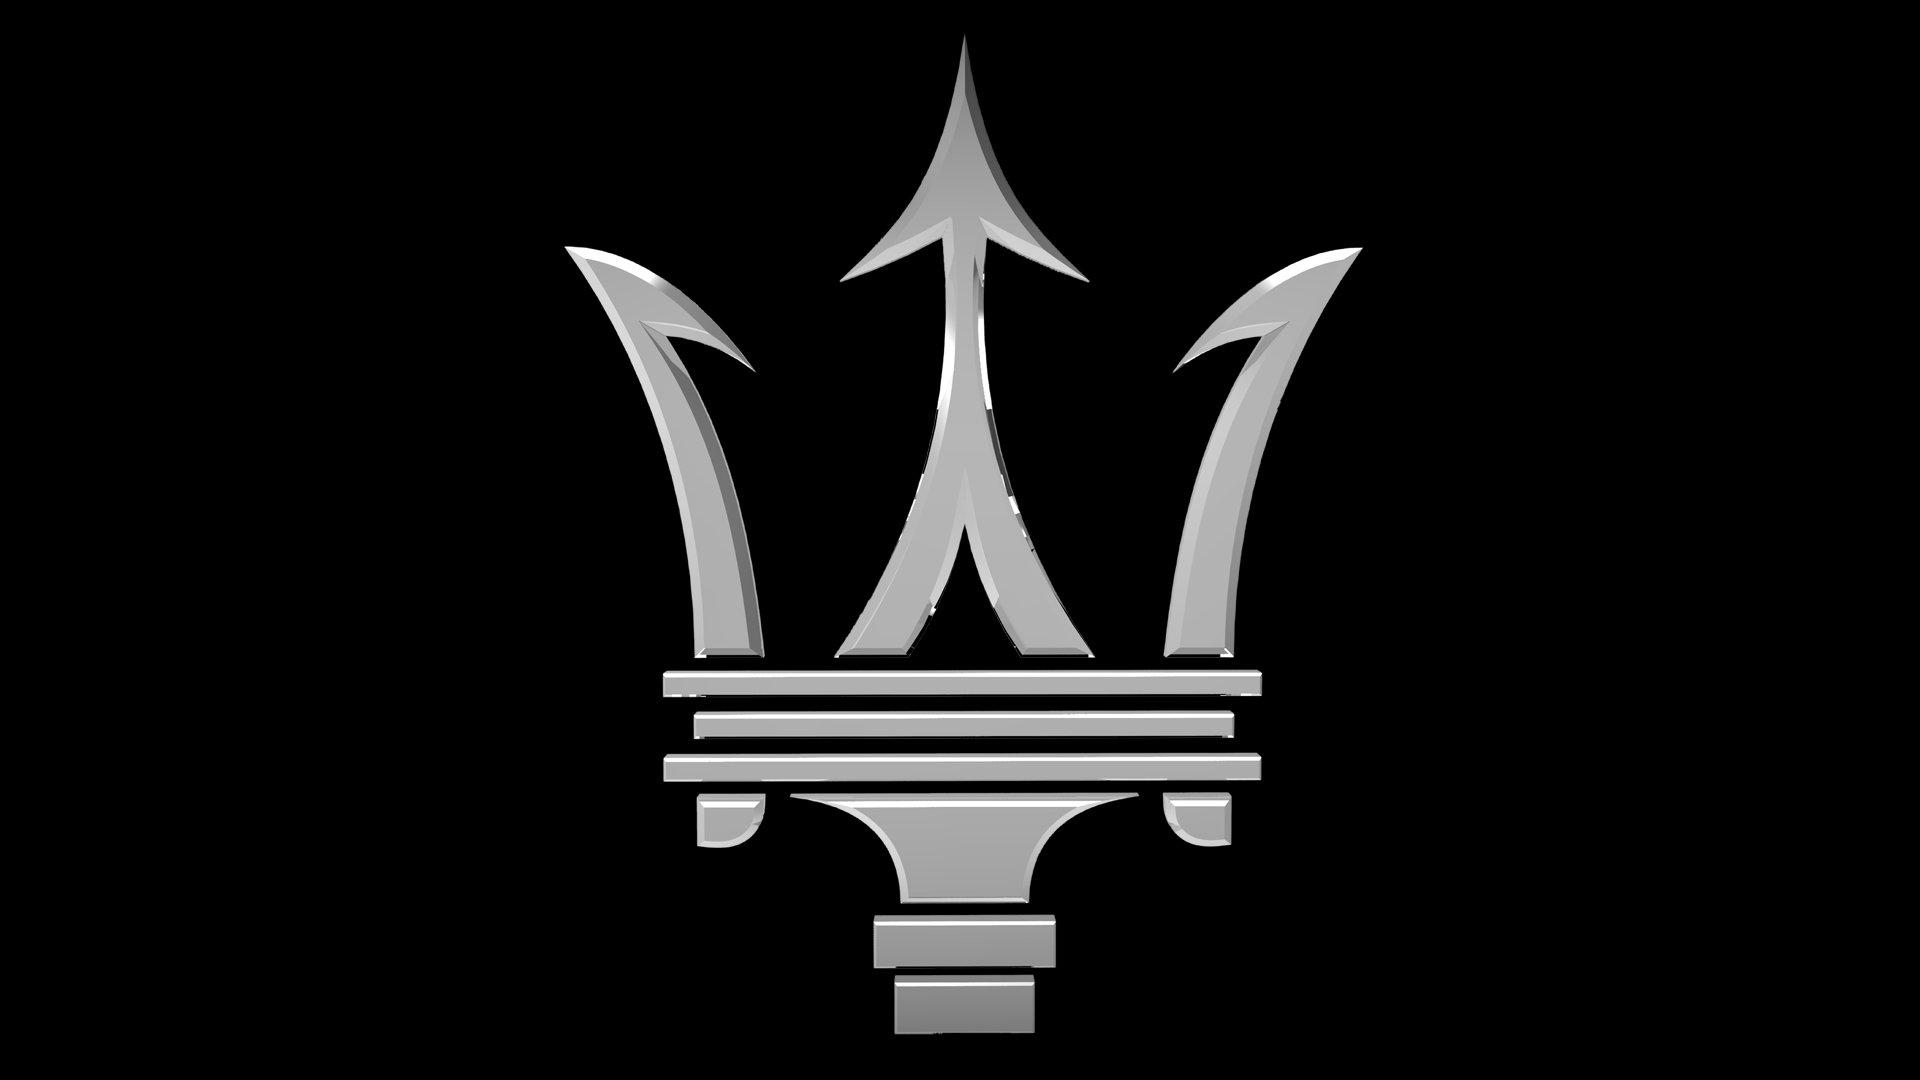 maserati logo maserati symbol meaning history and evolution. Black Bedroom Furniture Sets. Home Design Ideas